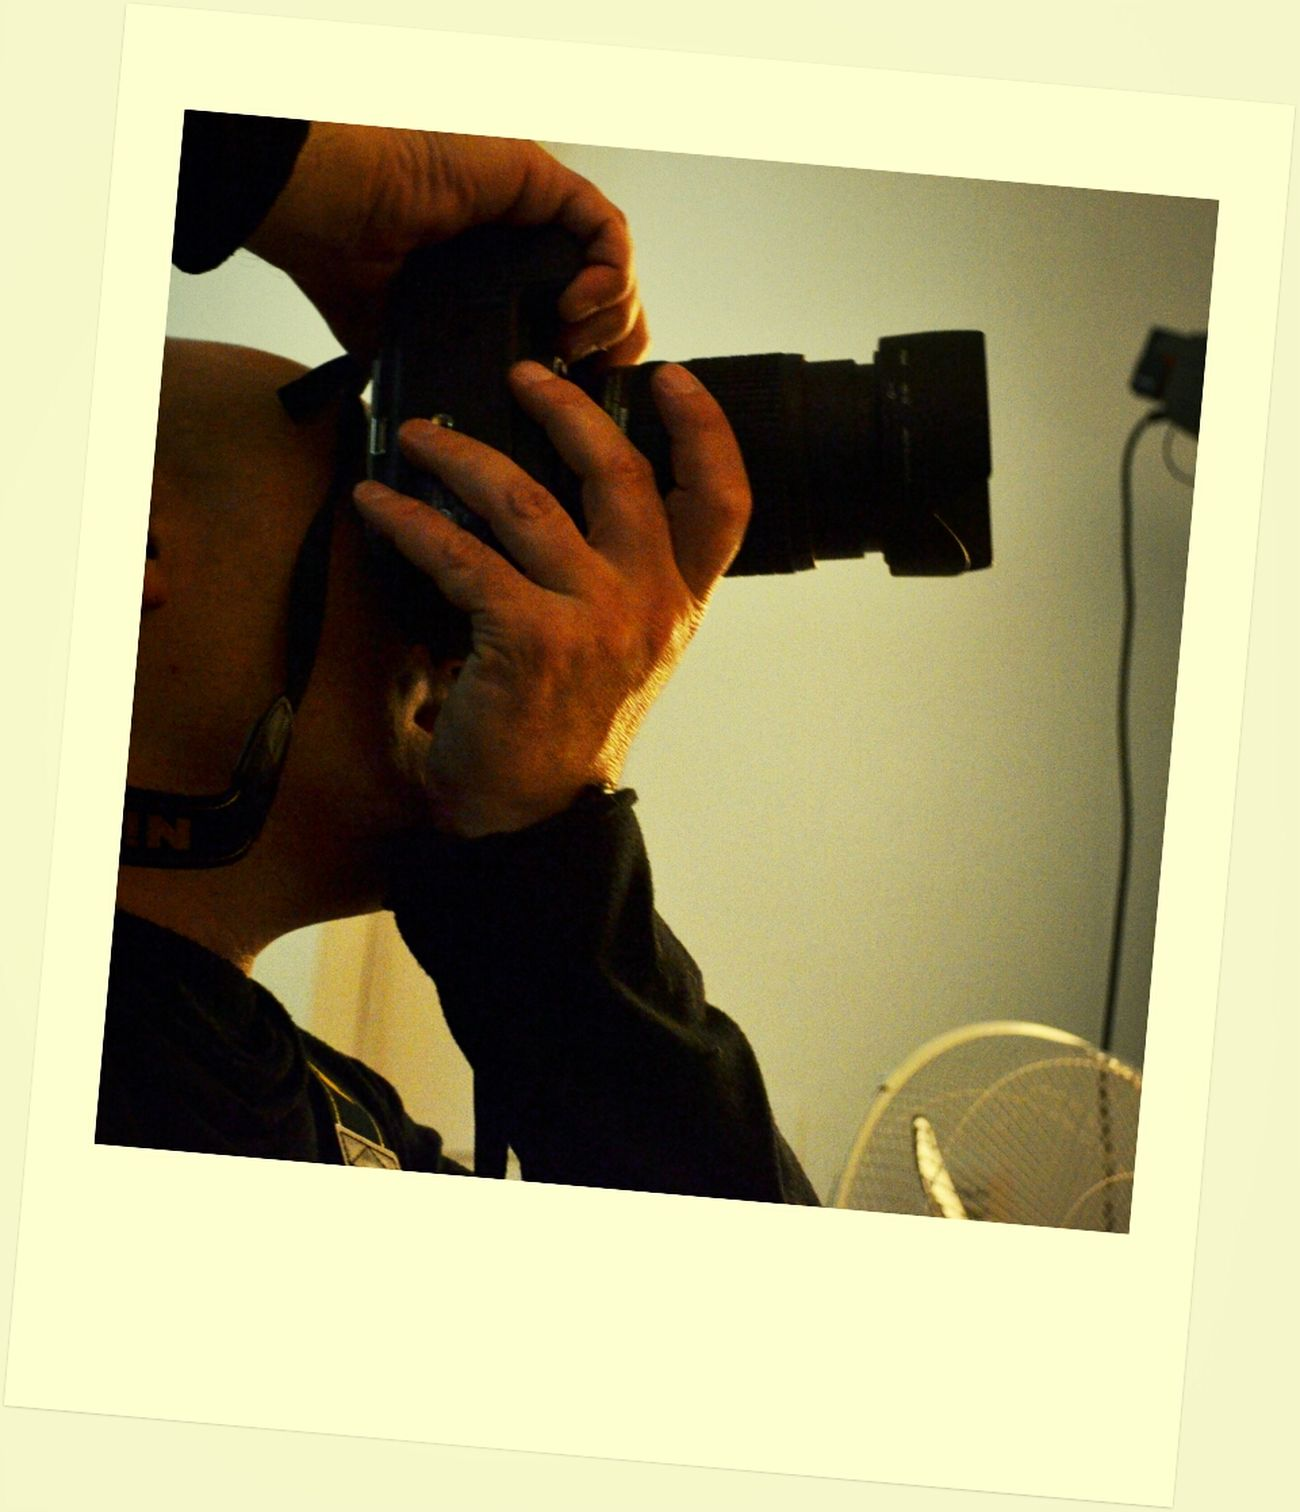 cazador cazado - Carlos Portrait The Portraitist - 2014 EyeEm Awards The Photographer Taking The Photo